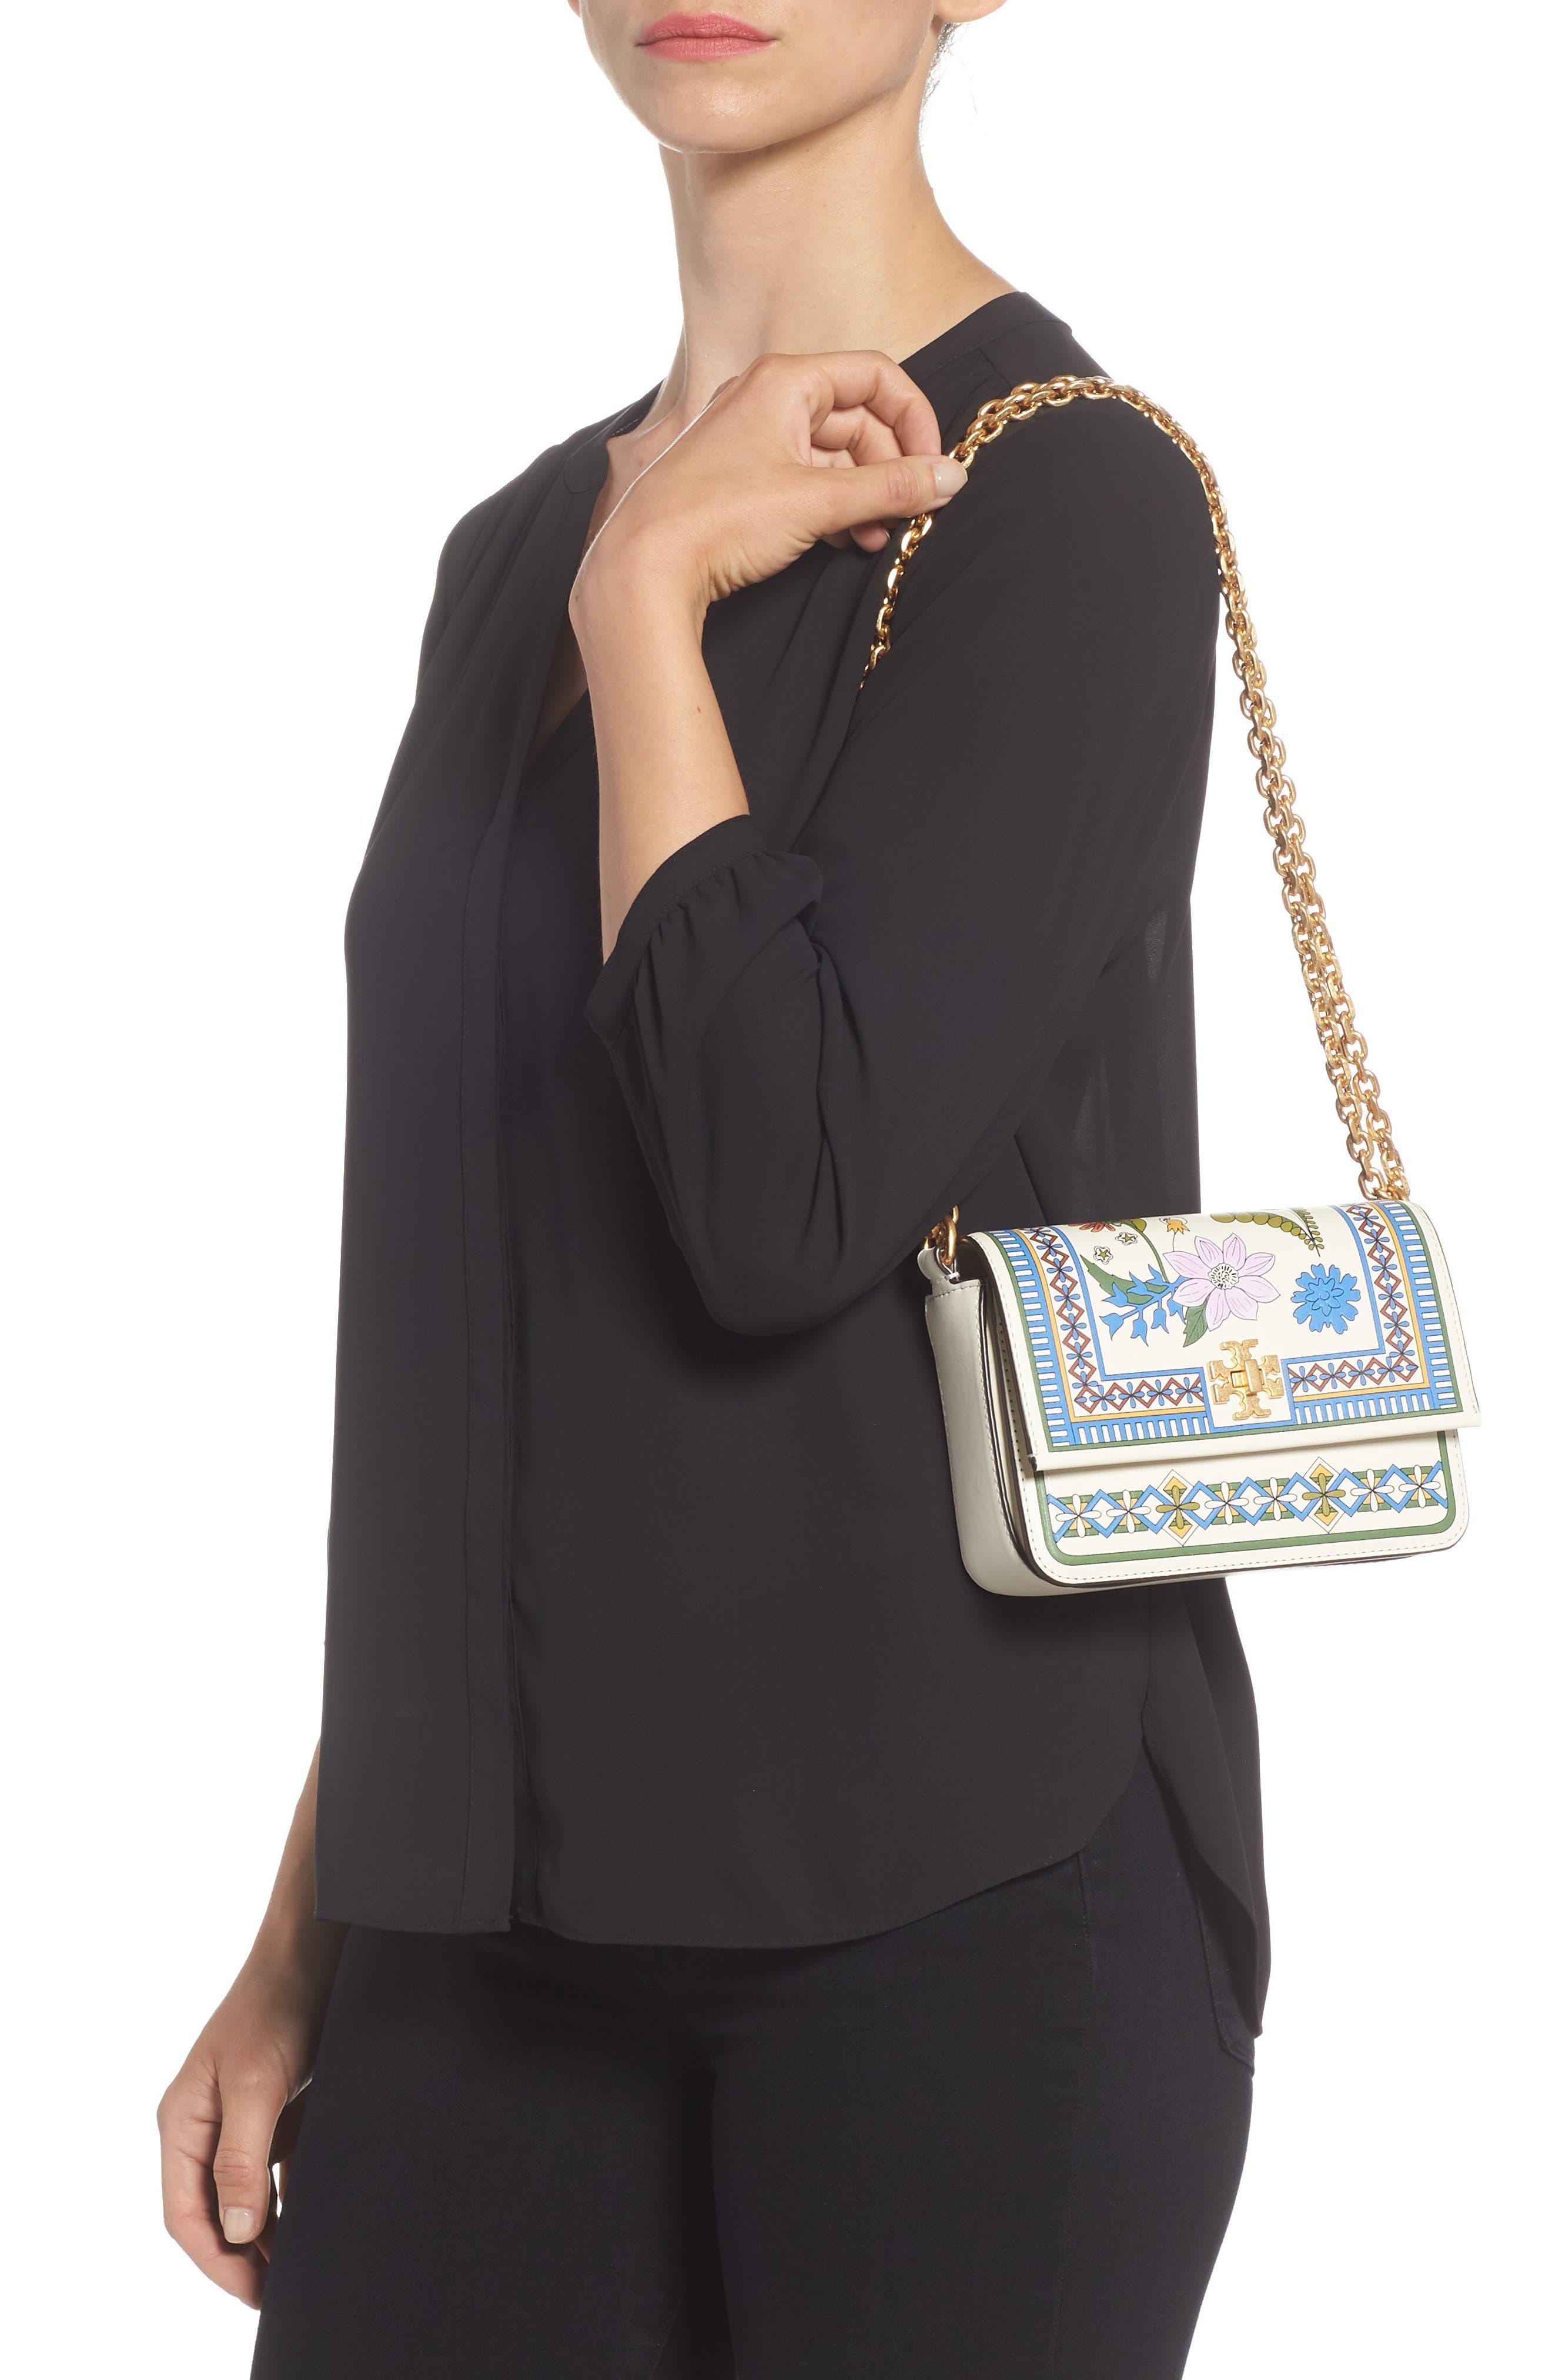 Mini Kira Floral Print Leather Bag,                             Alternate thumbnail 2, color,                             IVORY MEADOW SWEET